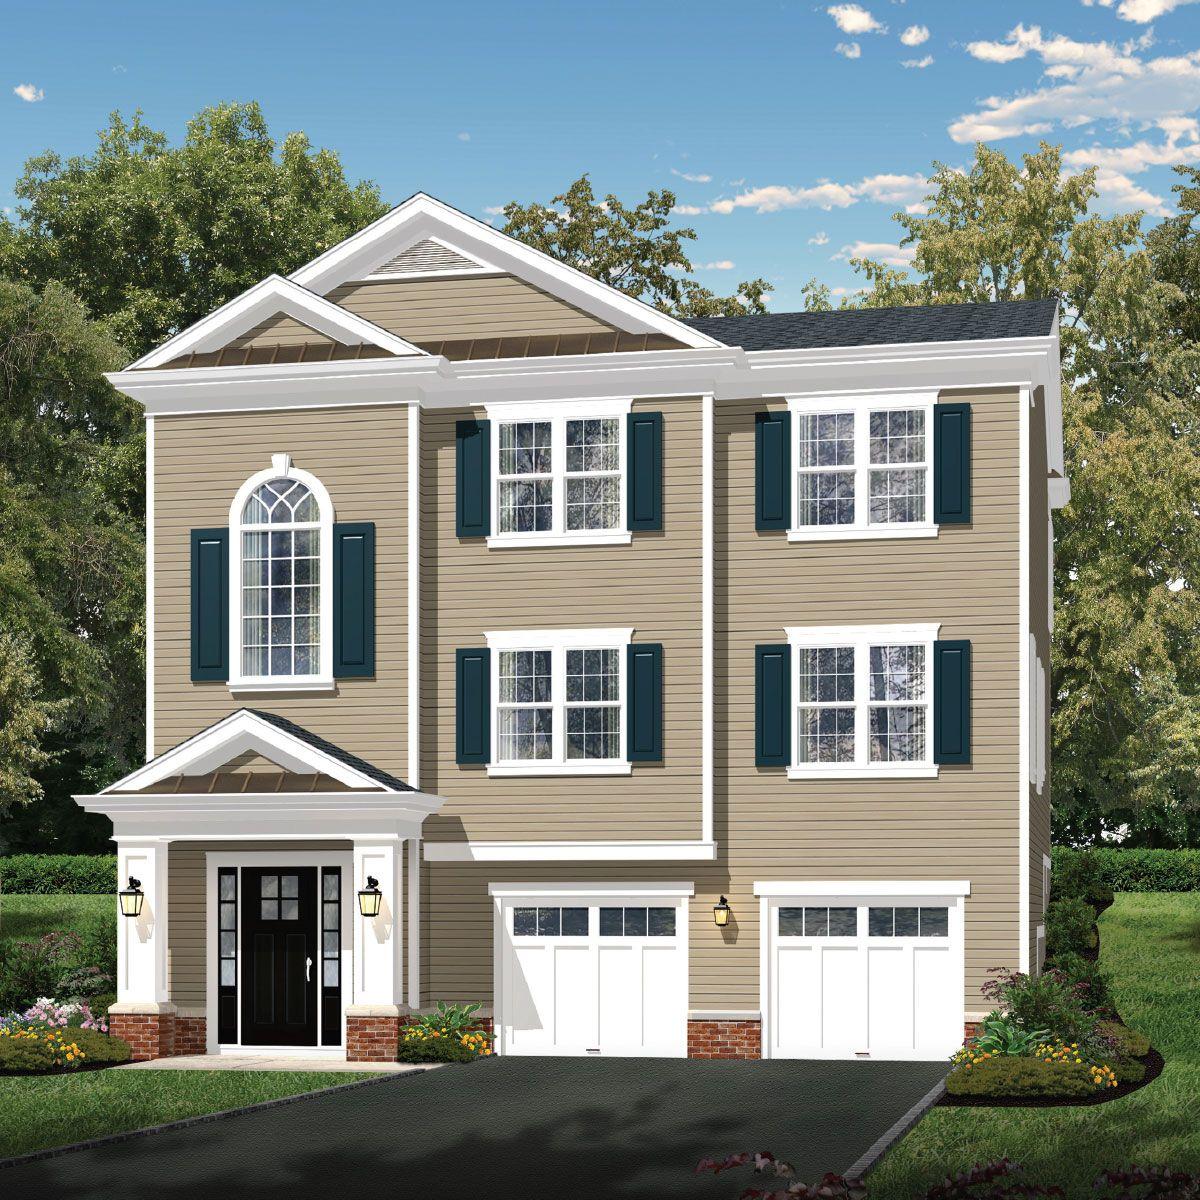 Luxury Home Builders Nj: New Homes In Bergen County, NJ